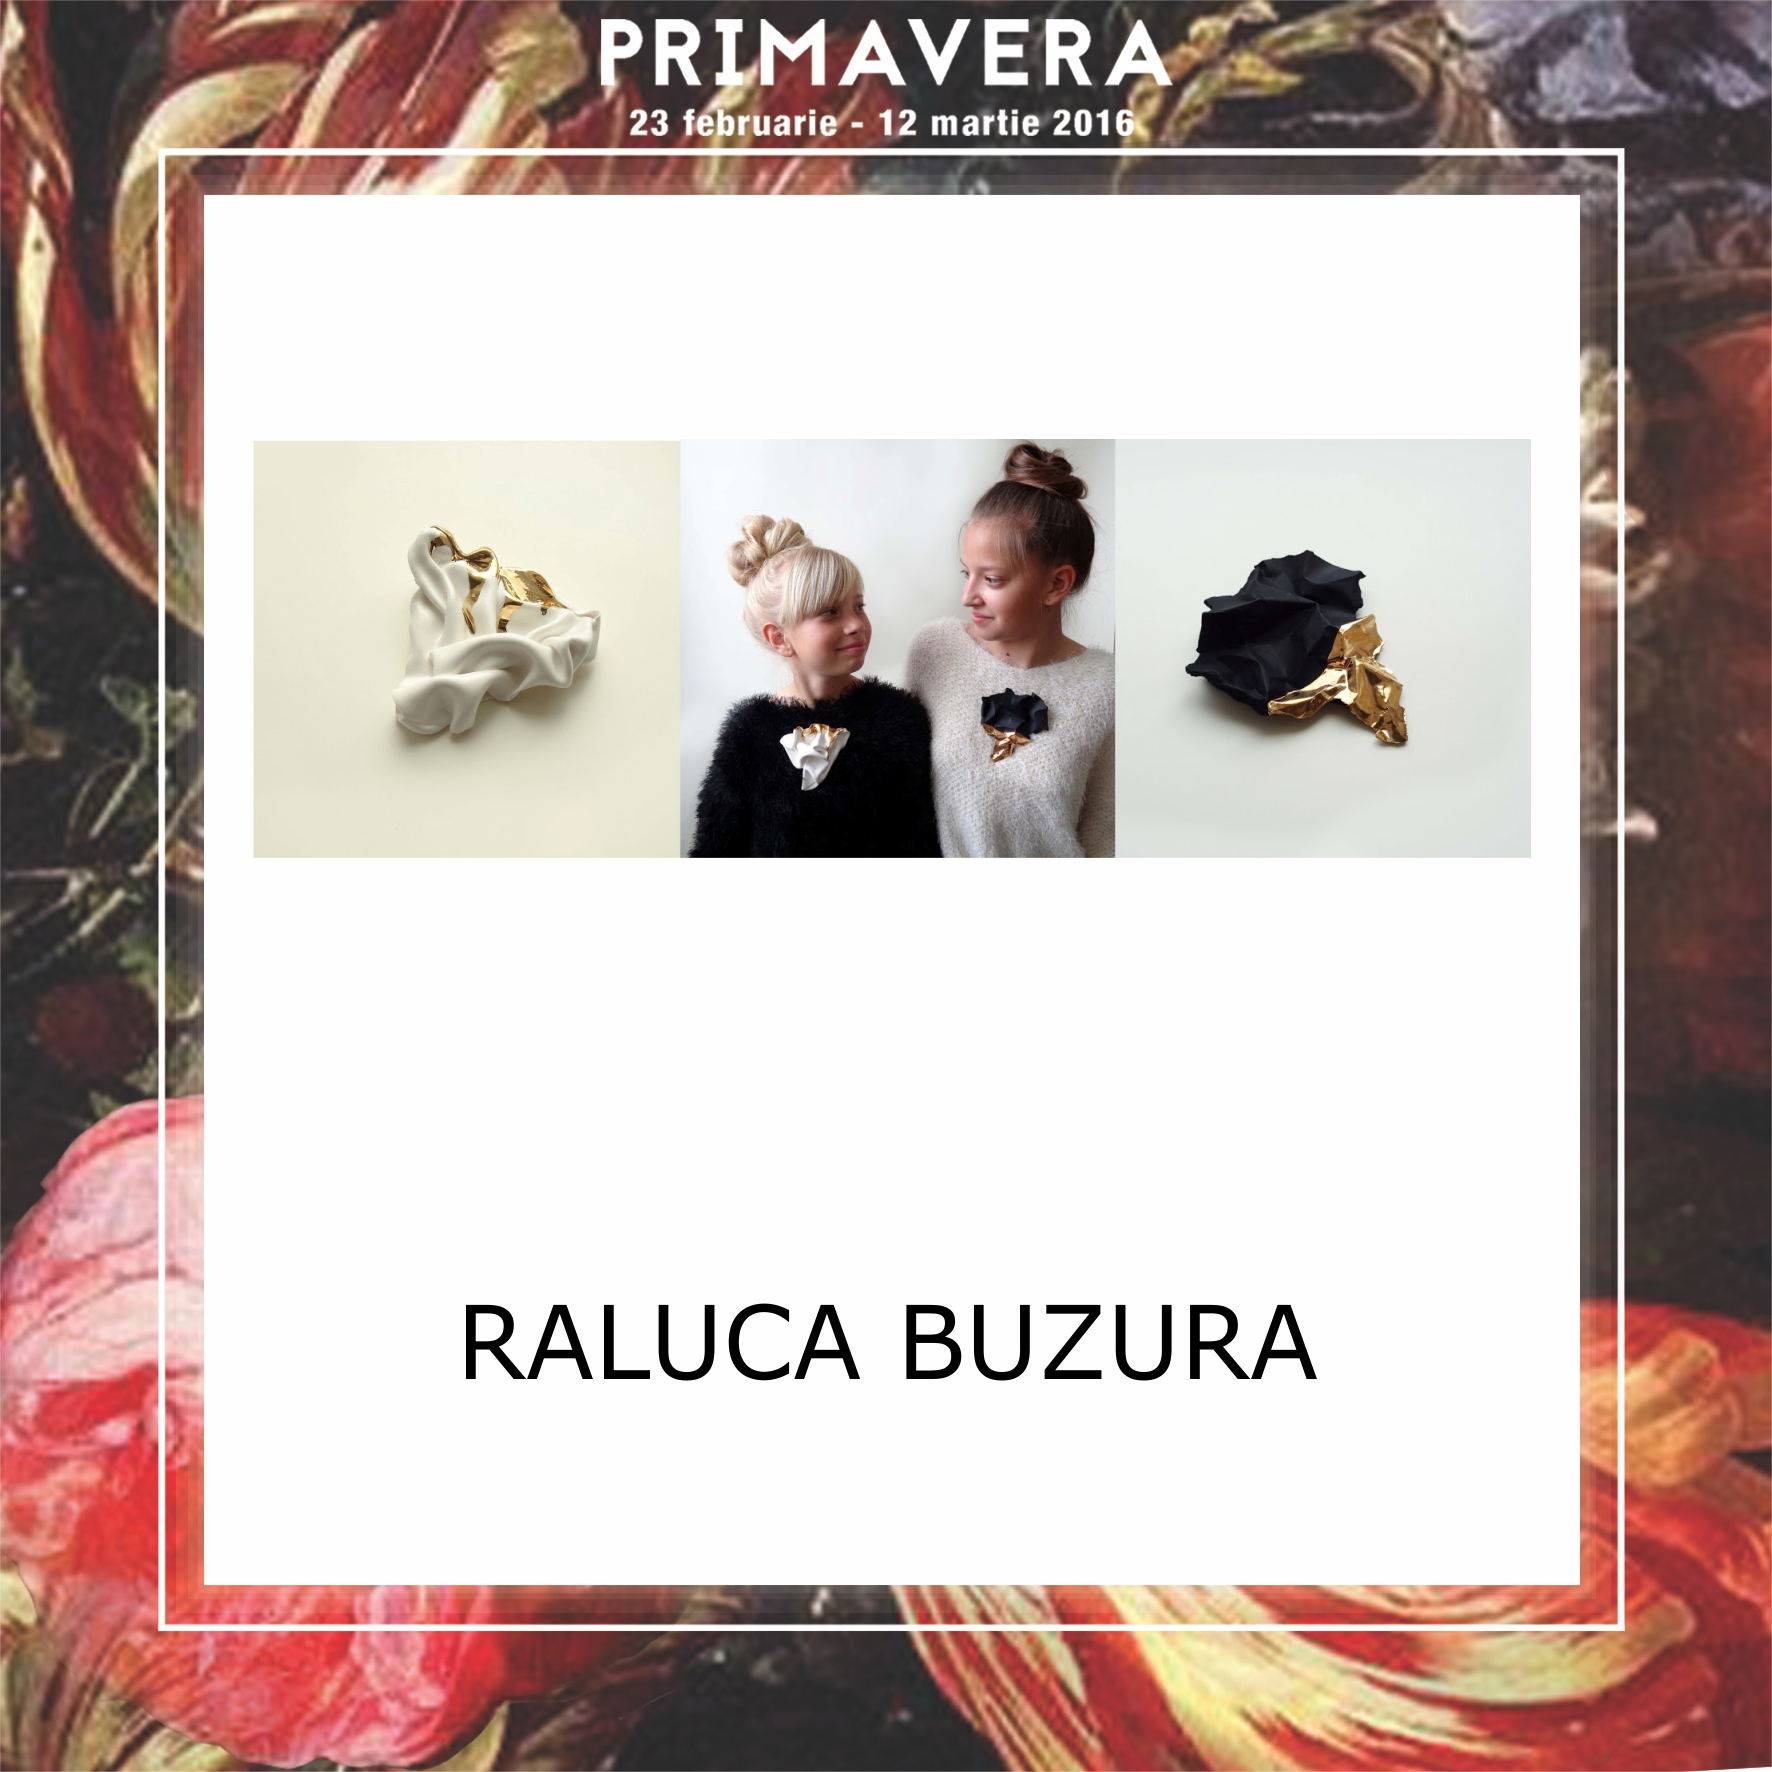 Raluca Buzura